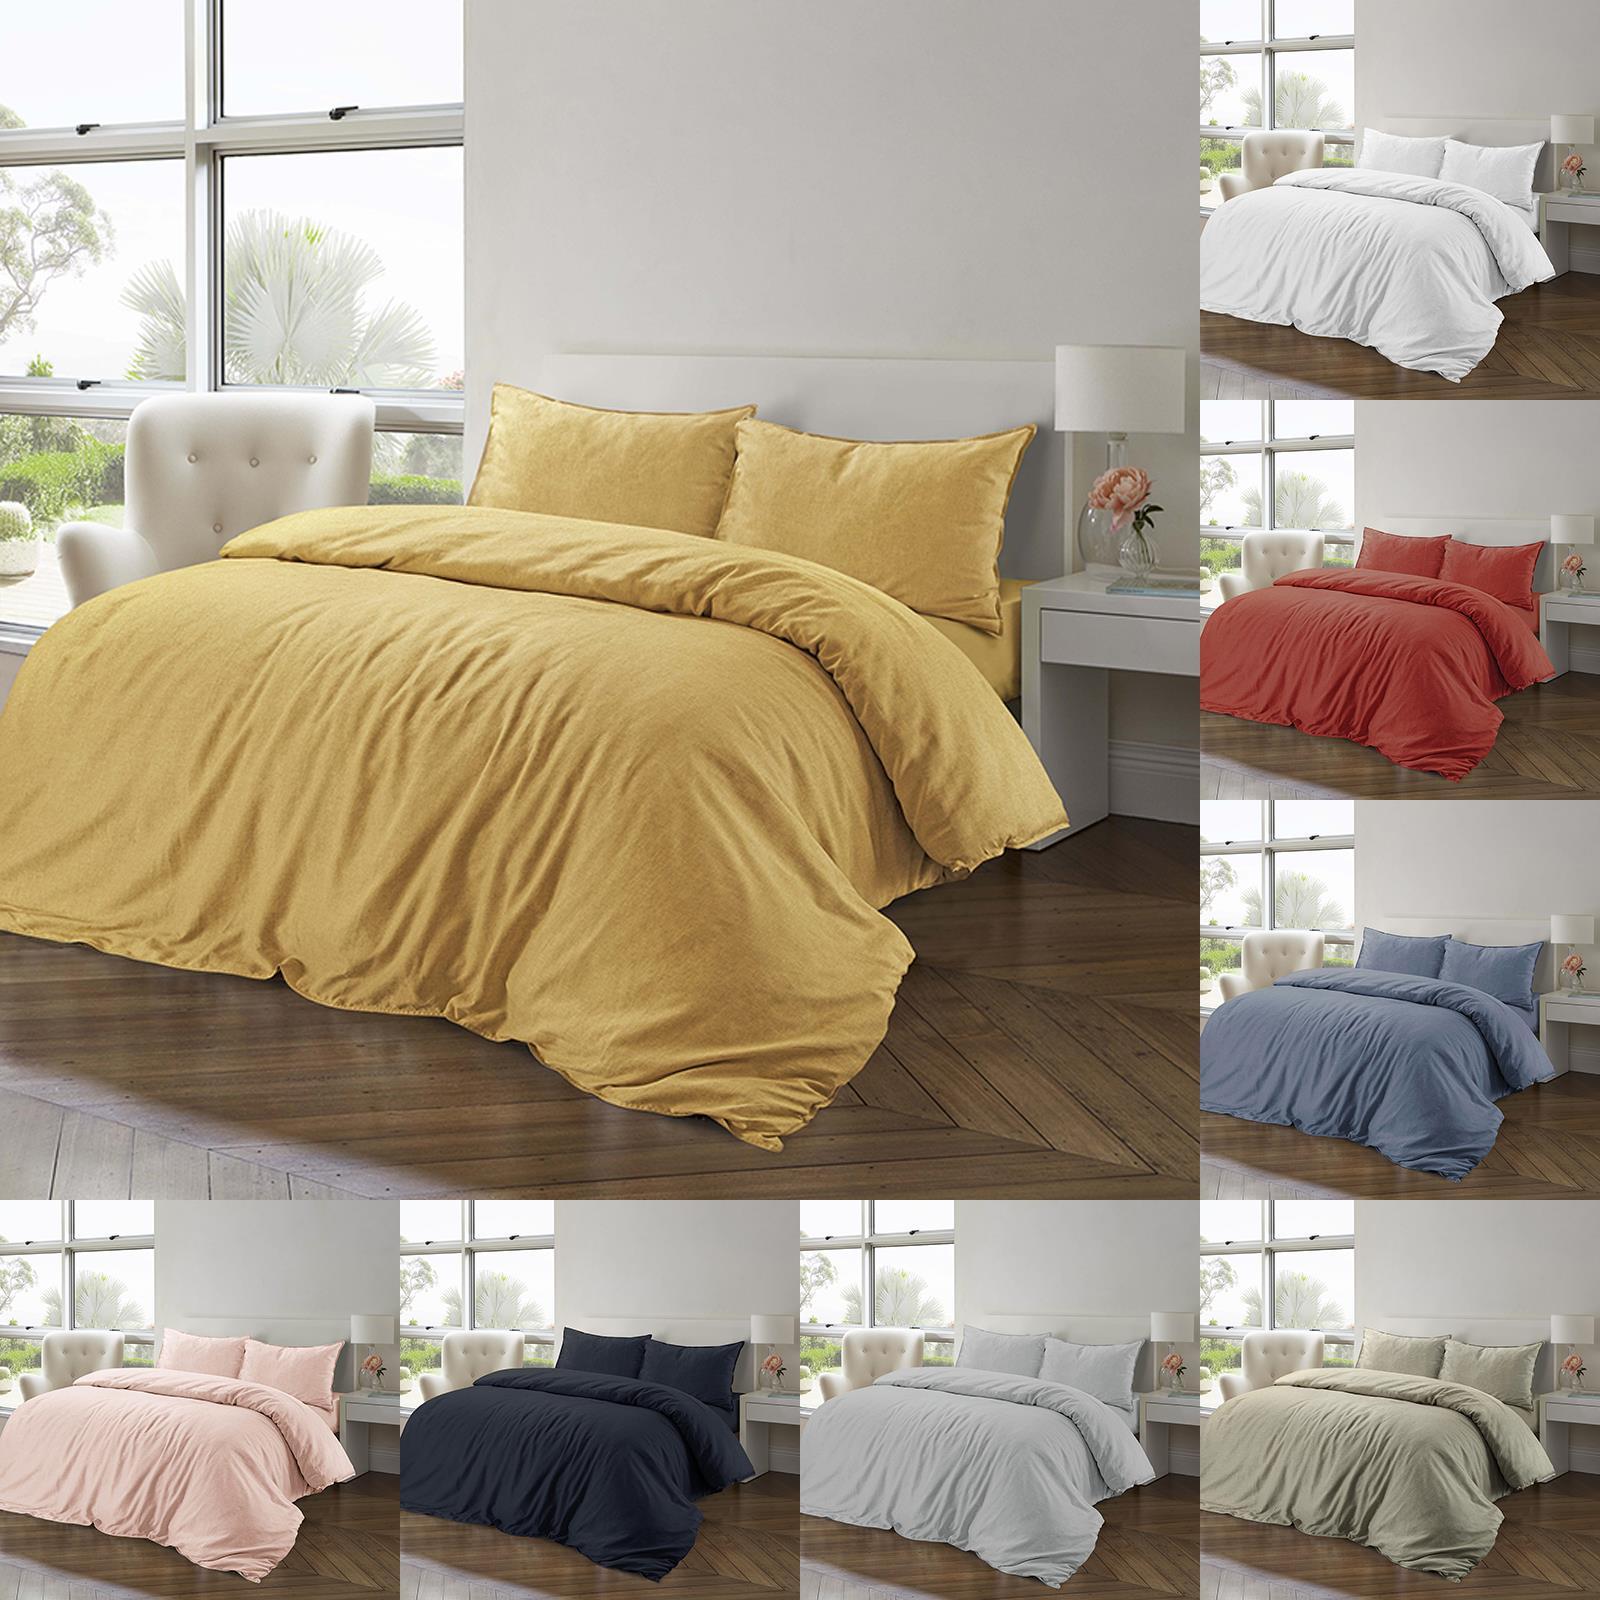 Bedding Sets Duvet Covers Duvet Cover With Pillow Case Natural Quilt Cover Bedding Set Single Double King Home Furniture Diy Tohoku Morinagamilk Co Jp